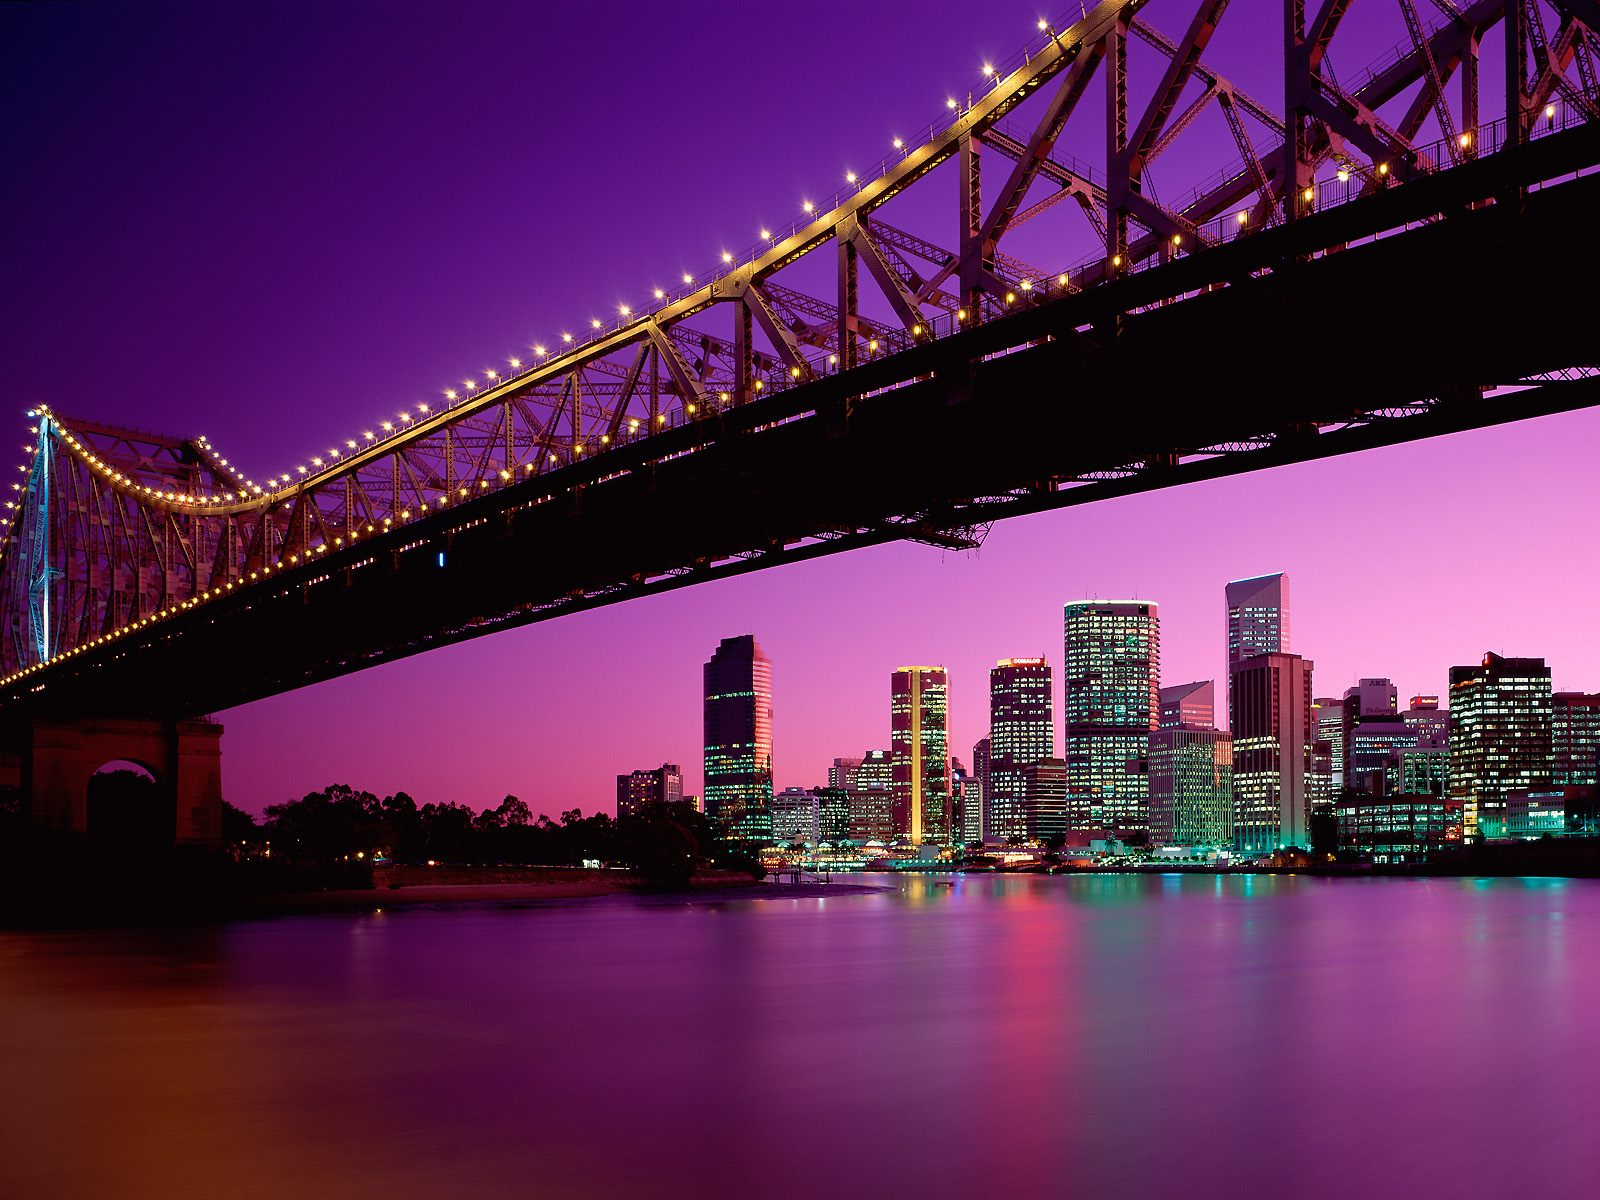 https://i0.wp.com/3.bp.blogspot.com/_6KbelgiYSgk/TU7y5VbpPCI/AAAAAAAAYMY/8c6_P19uSBM/s1600/Brisbane-Queensland-Australia.jpg